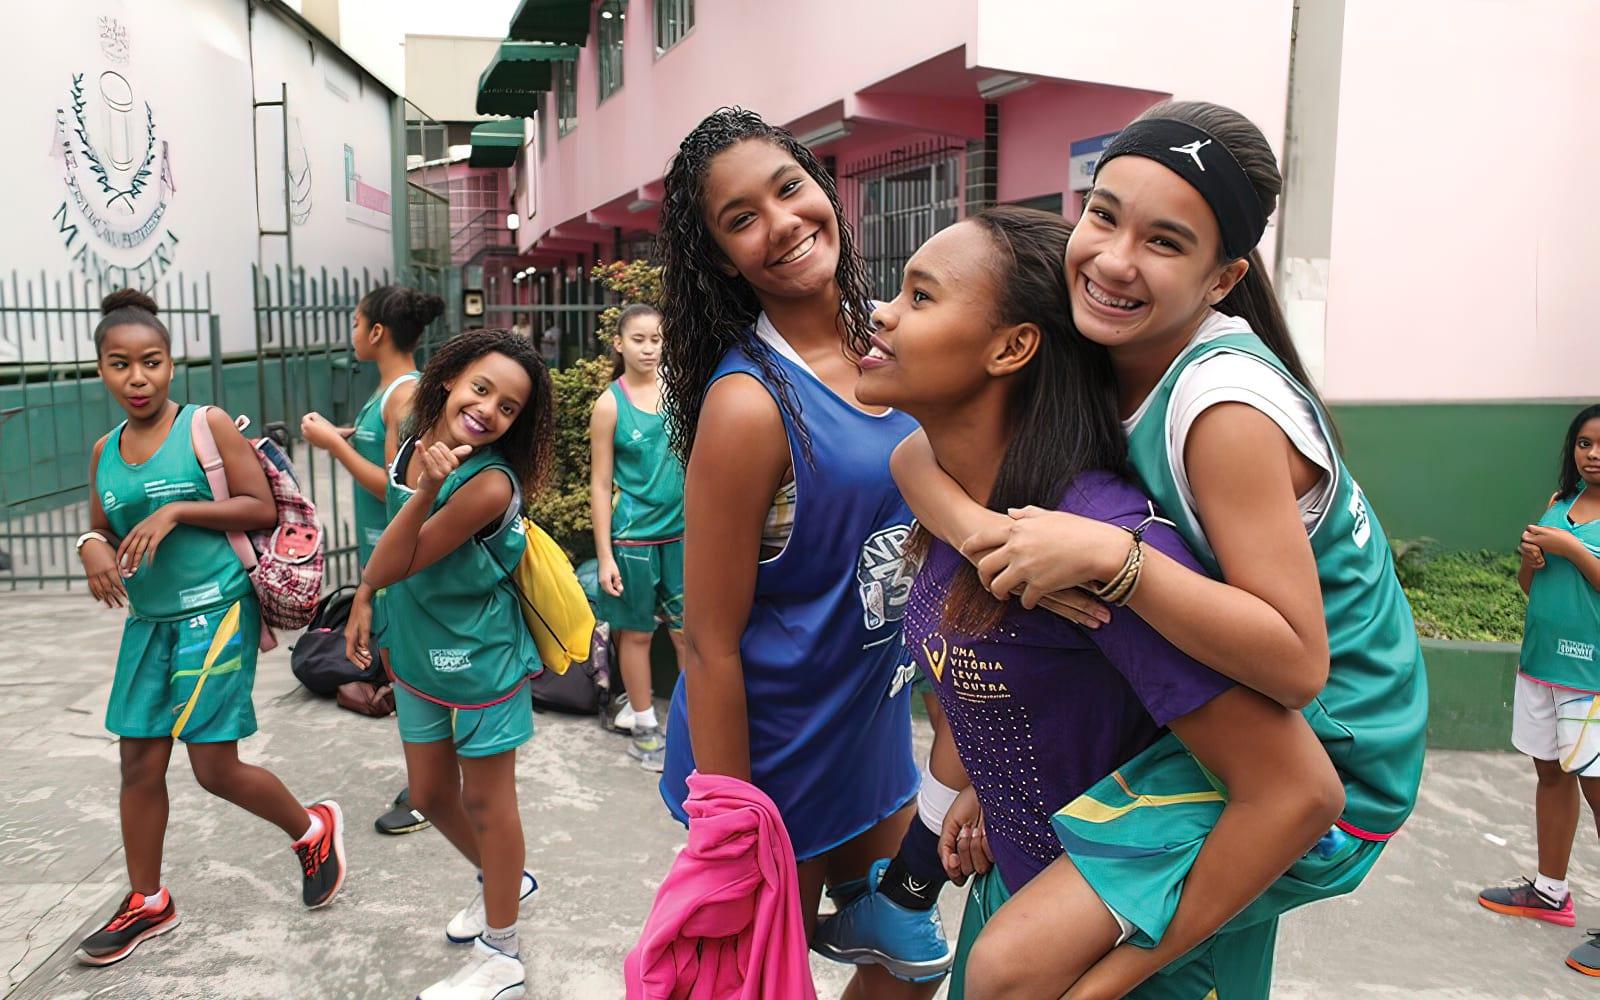 Group of young women / girls